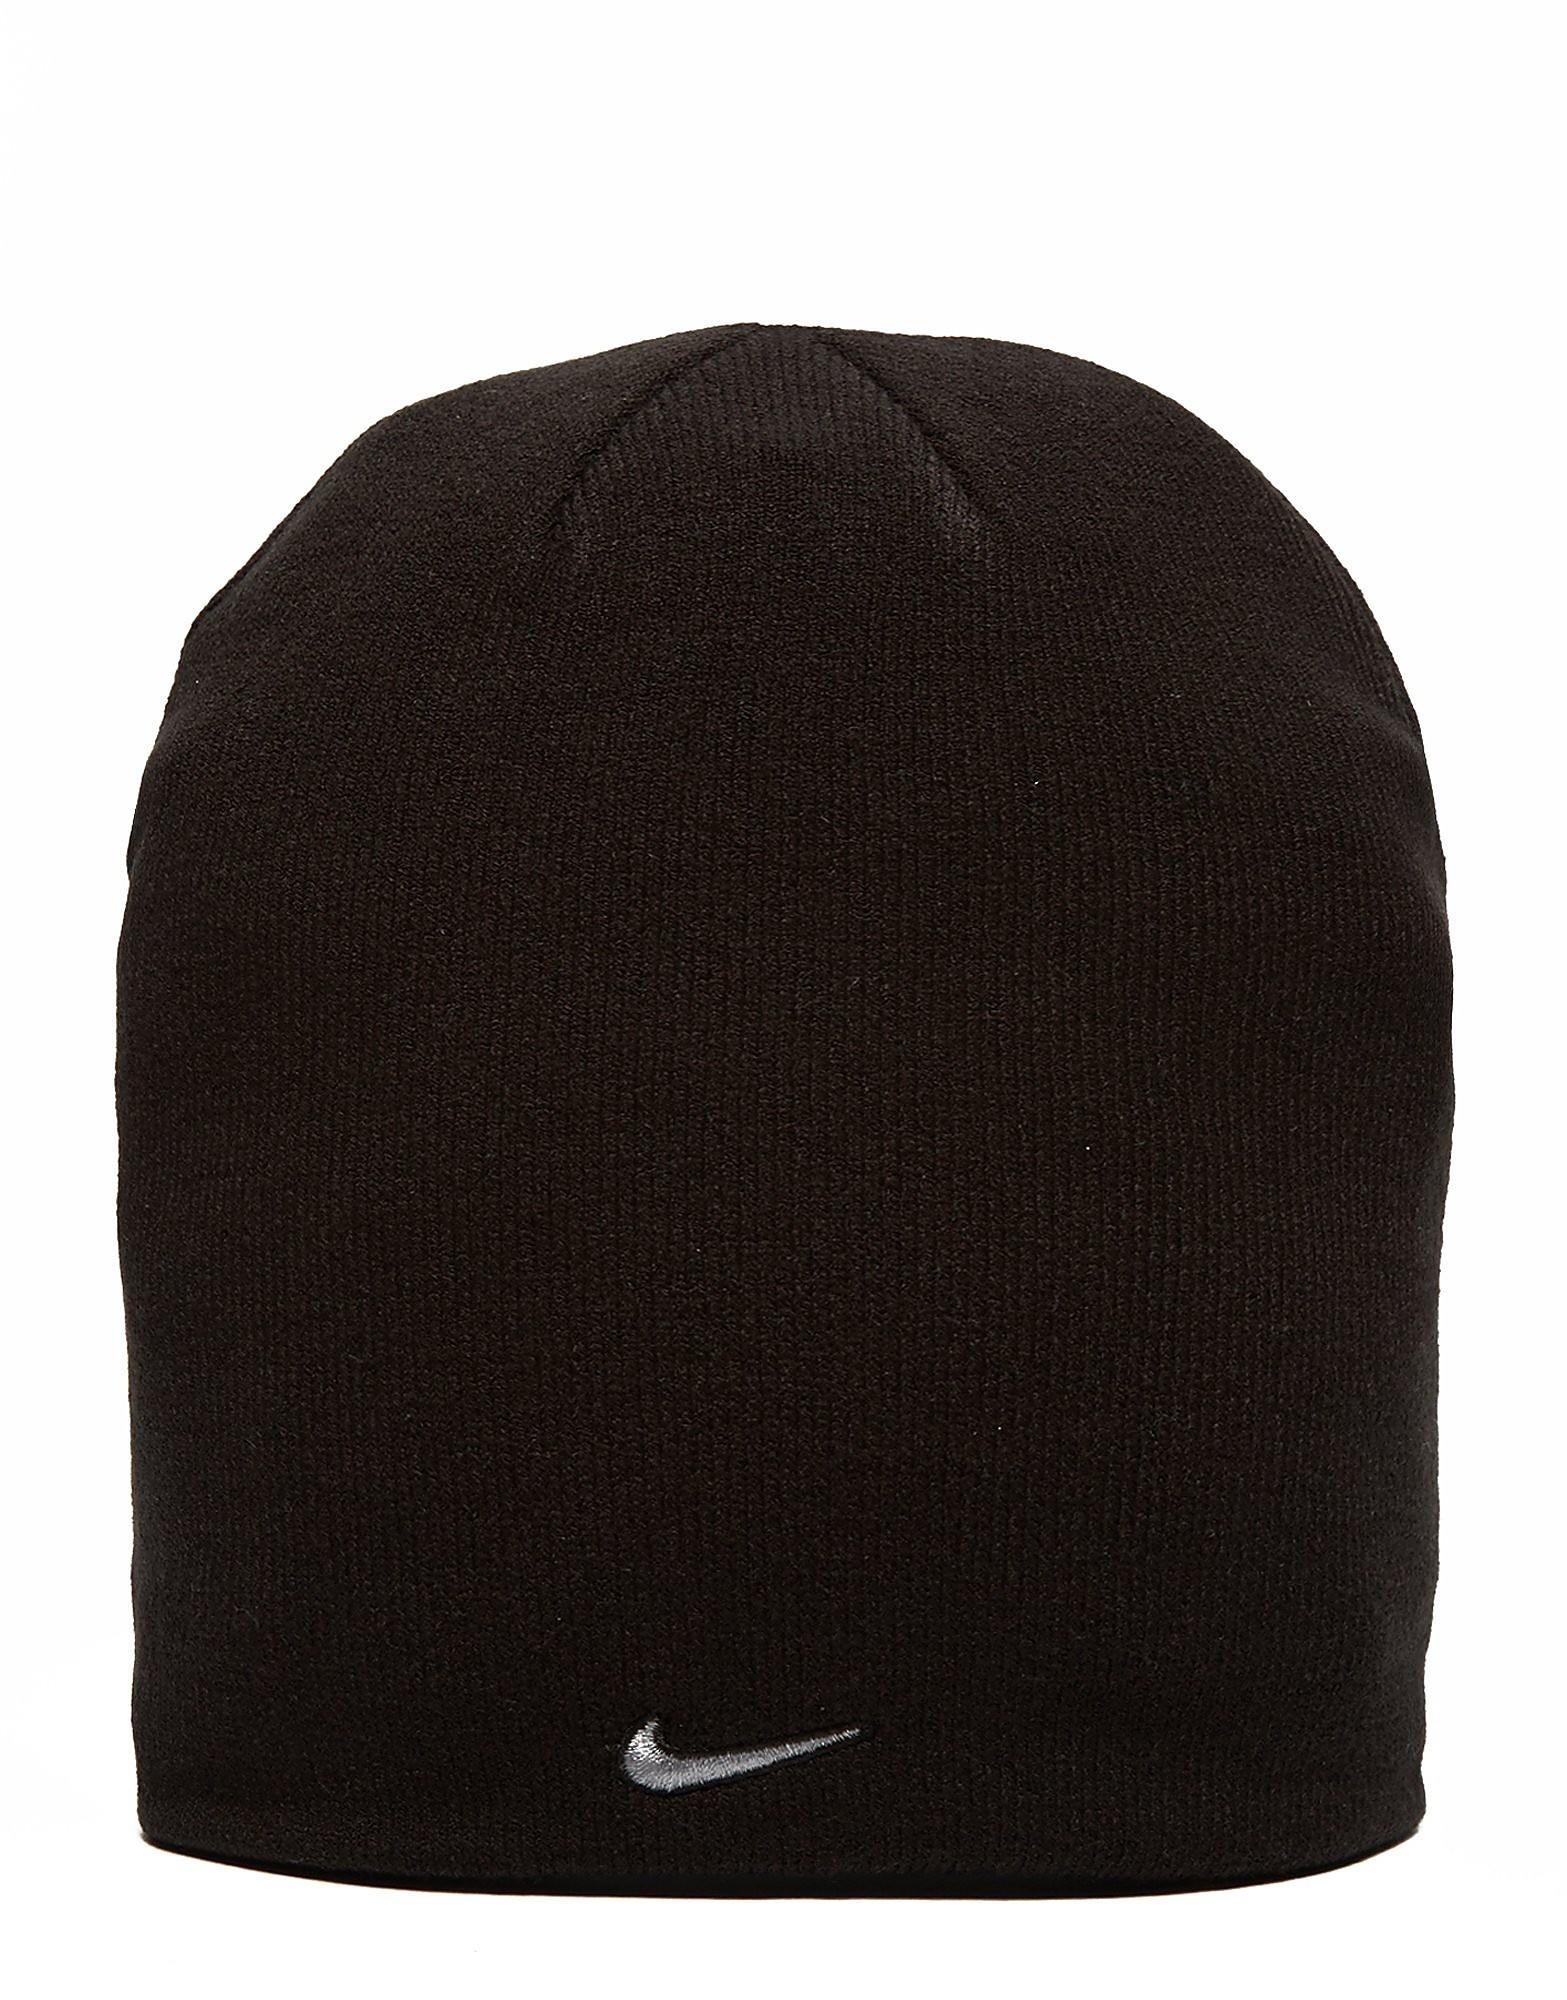 Nike Camo Spill Beanie